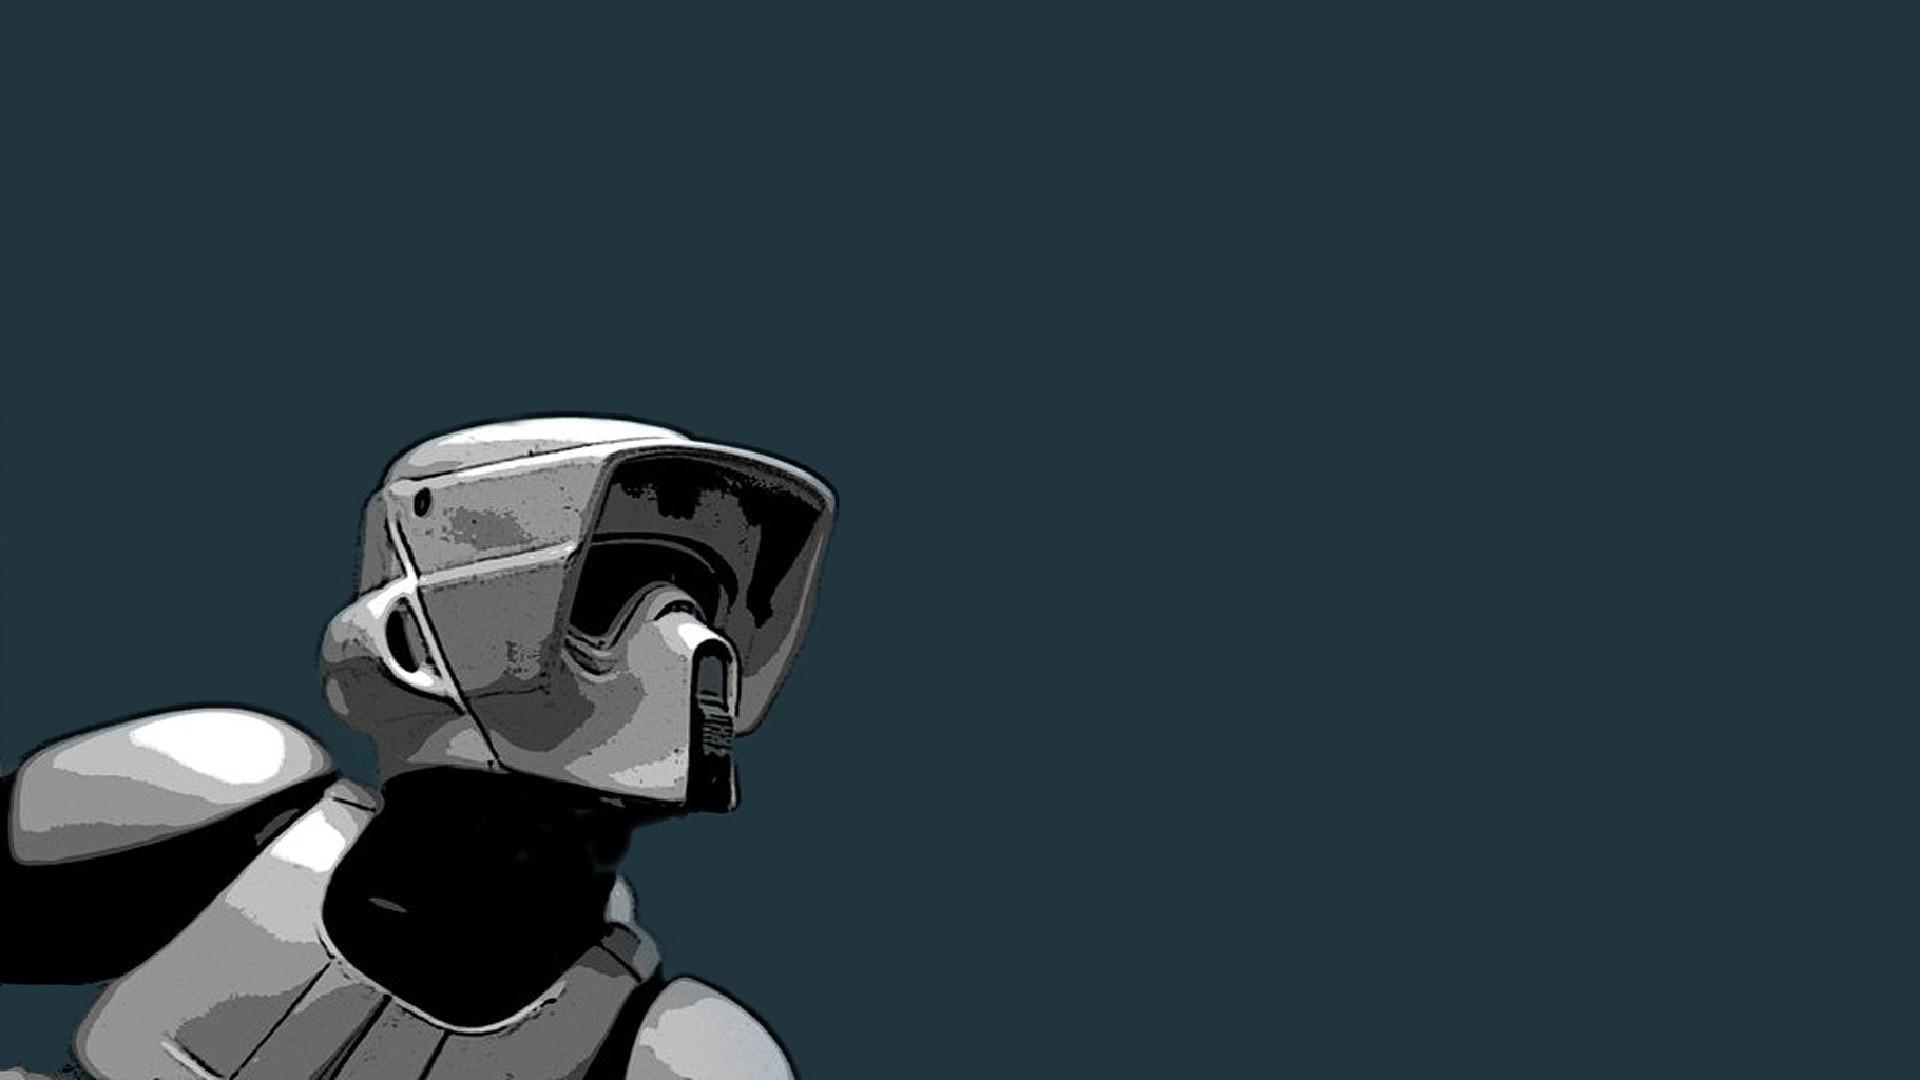 Star Wars Desktop Wallpaper 58 images